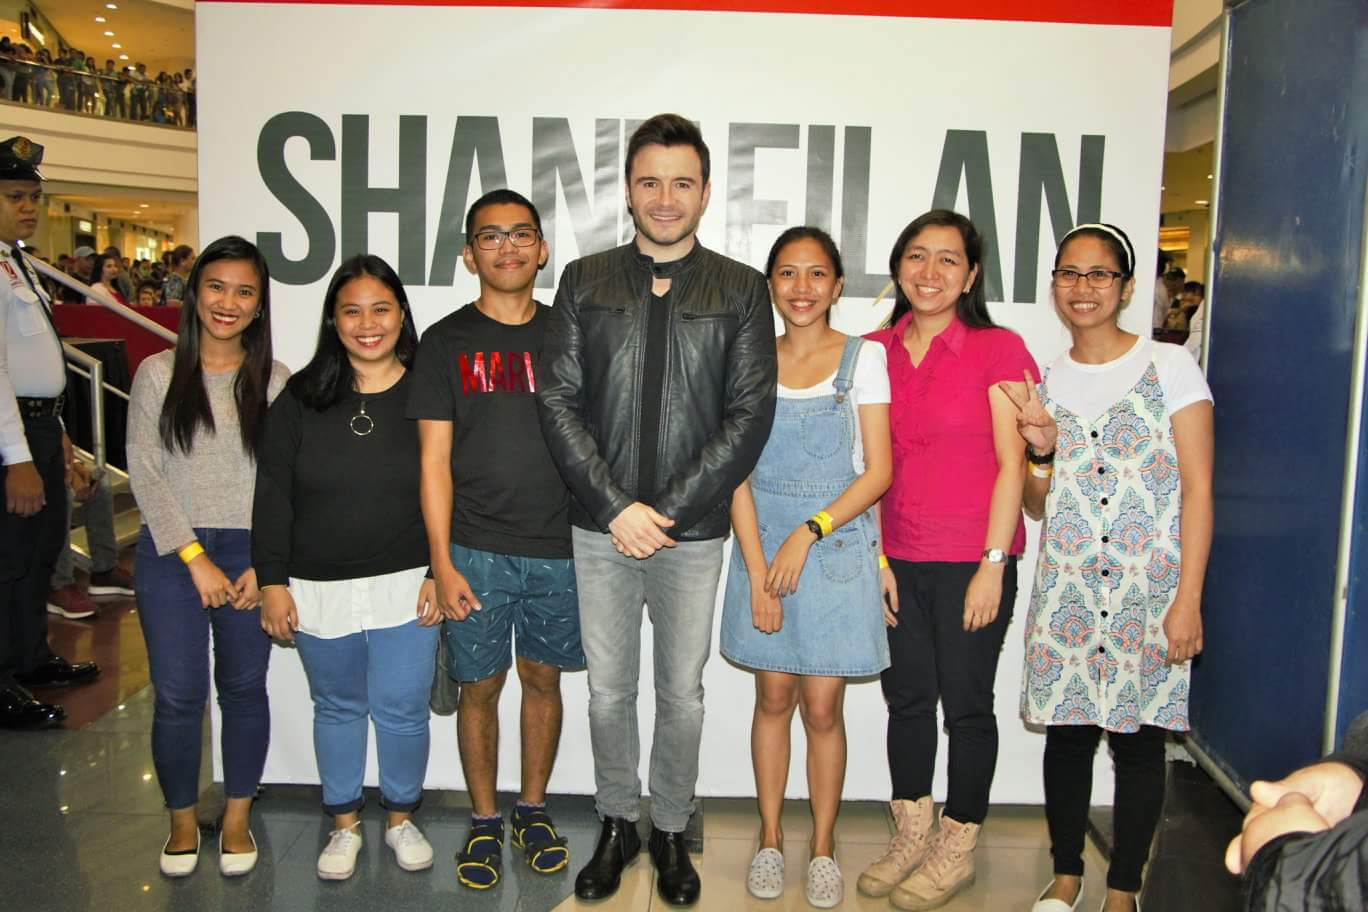 Shane Filan mall tour